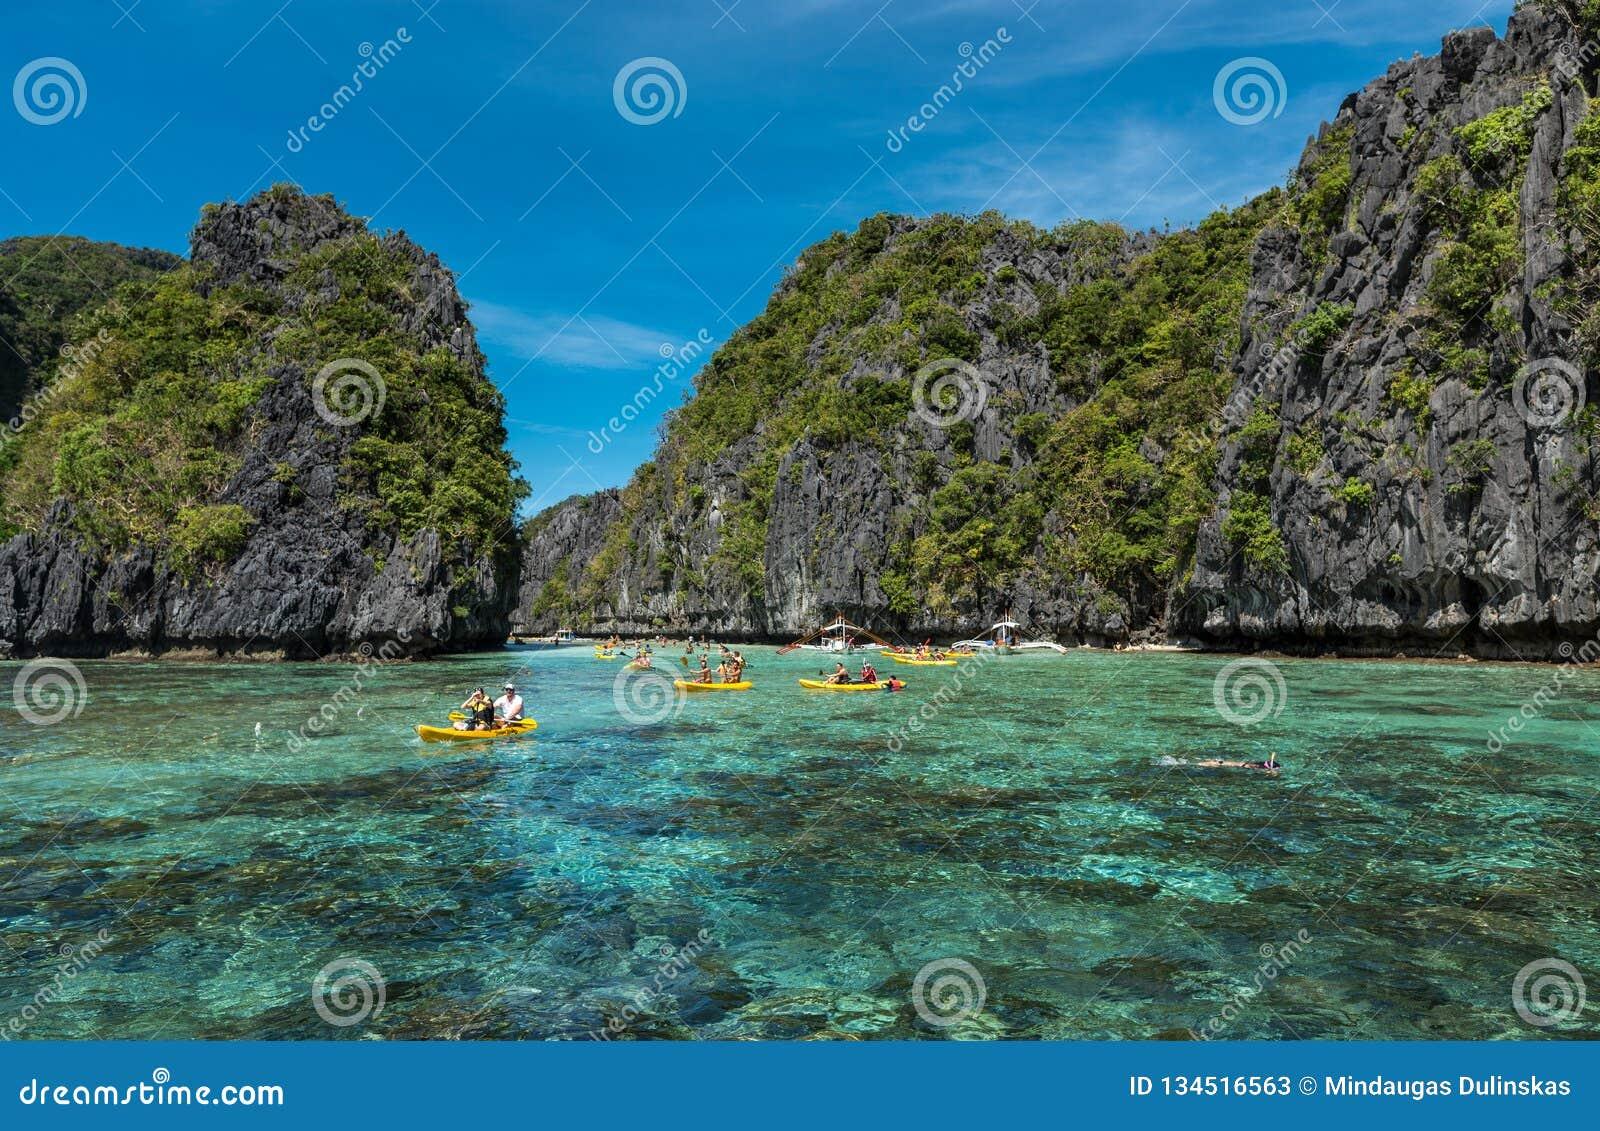 Big Lagoon In El Nido Palawan Sightseeing Place In